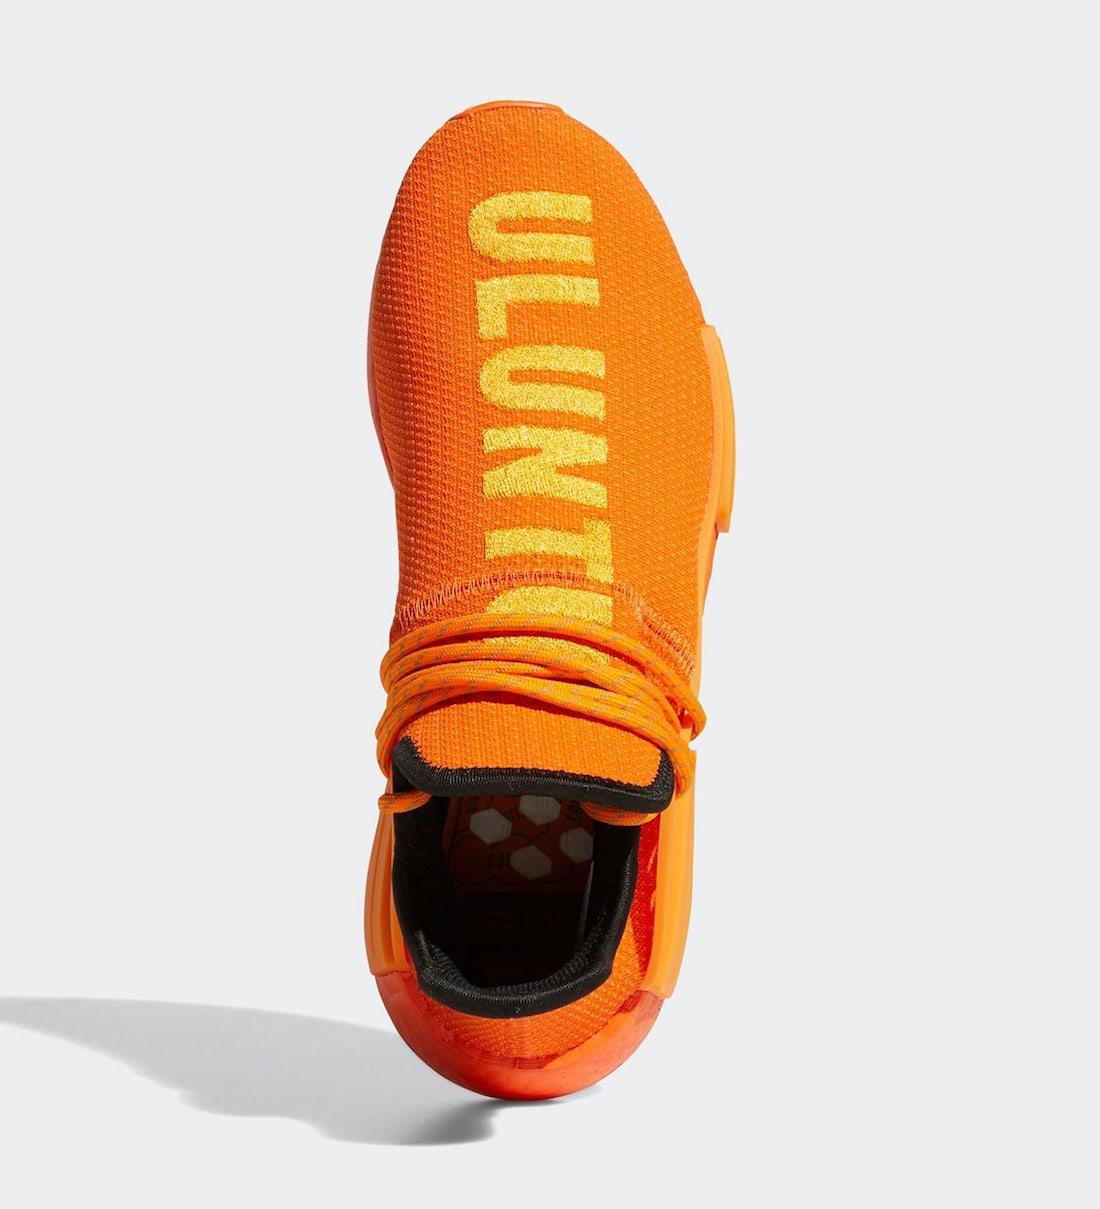 Pharrell adidas NMD Hu Orange GY0095 Release Price